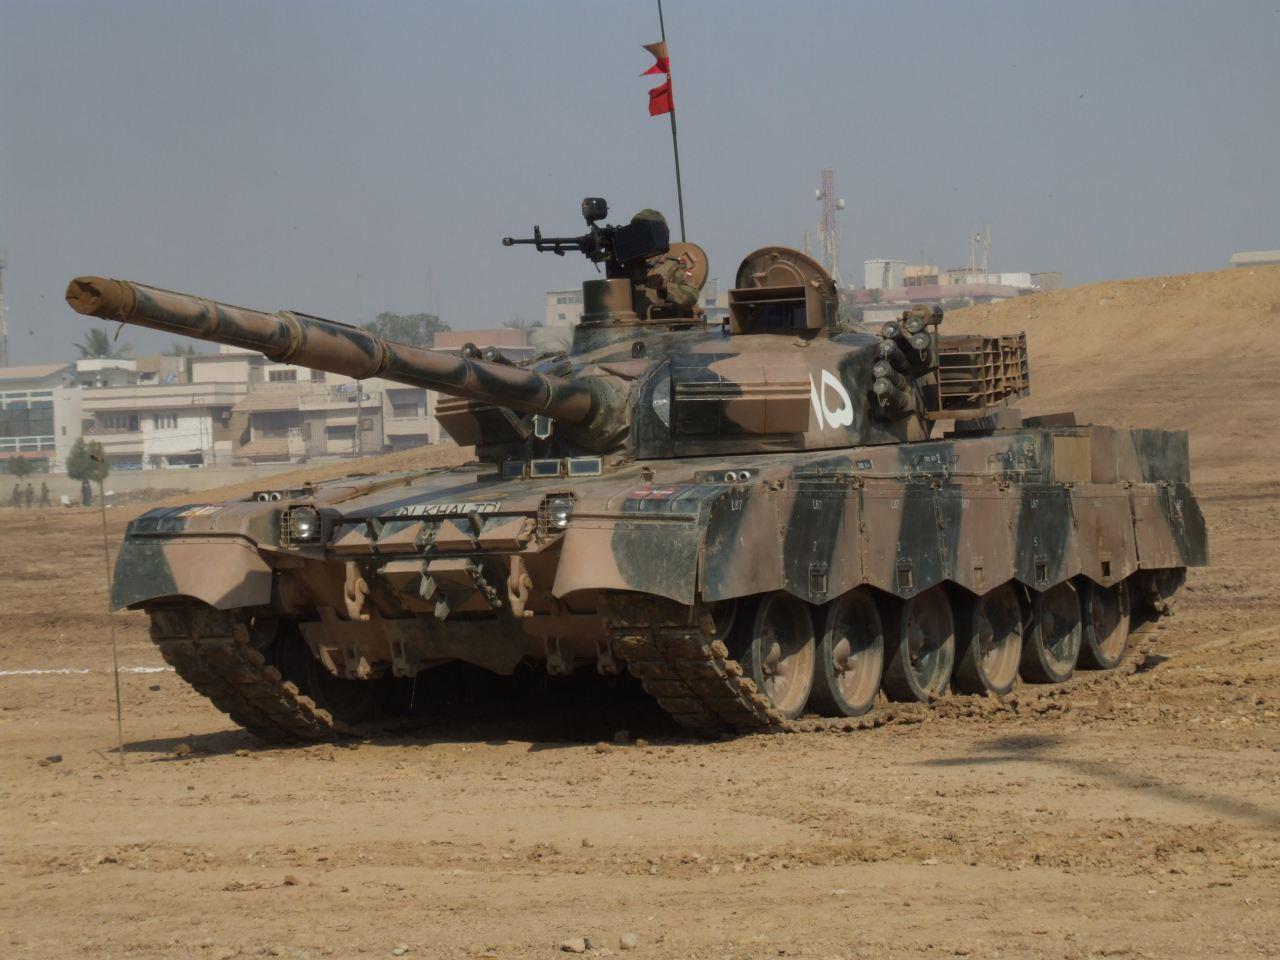 https://2.bp.blogspot.com/-l810vTTMlCg/TeKS0FFuPGI/AAAAAAAAAOo/2nBMyB1MXKw/s1600/al+khalid+mian+battle+tank+%2528Pakistan%2529+12.jpg